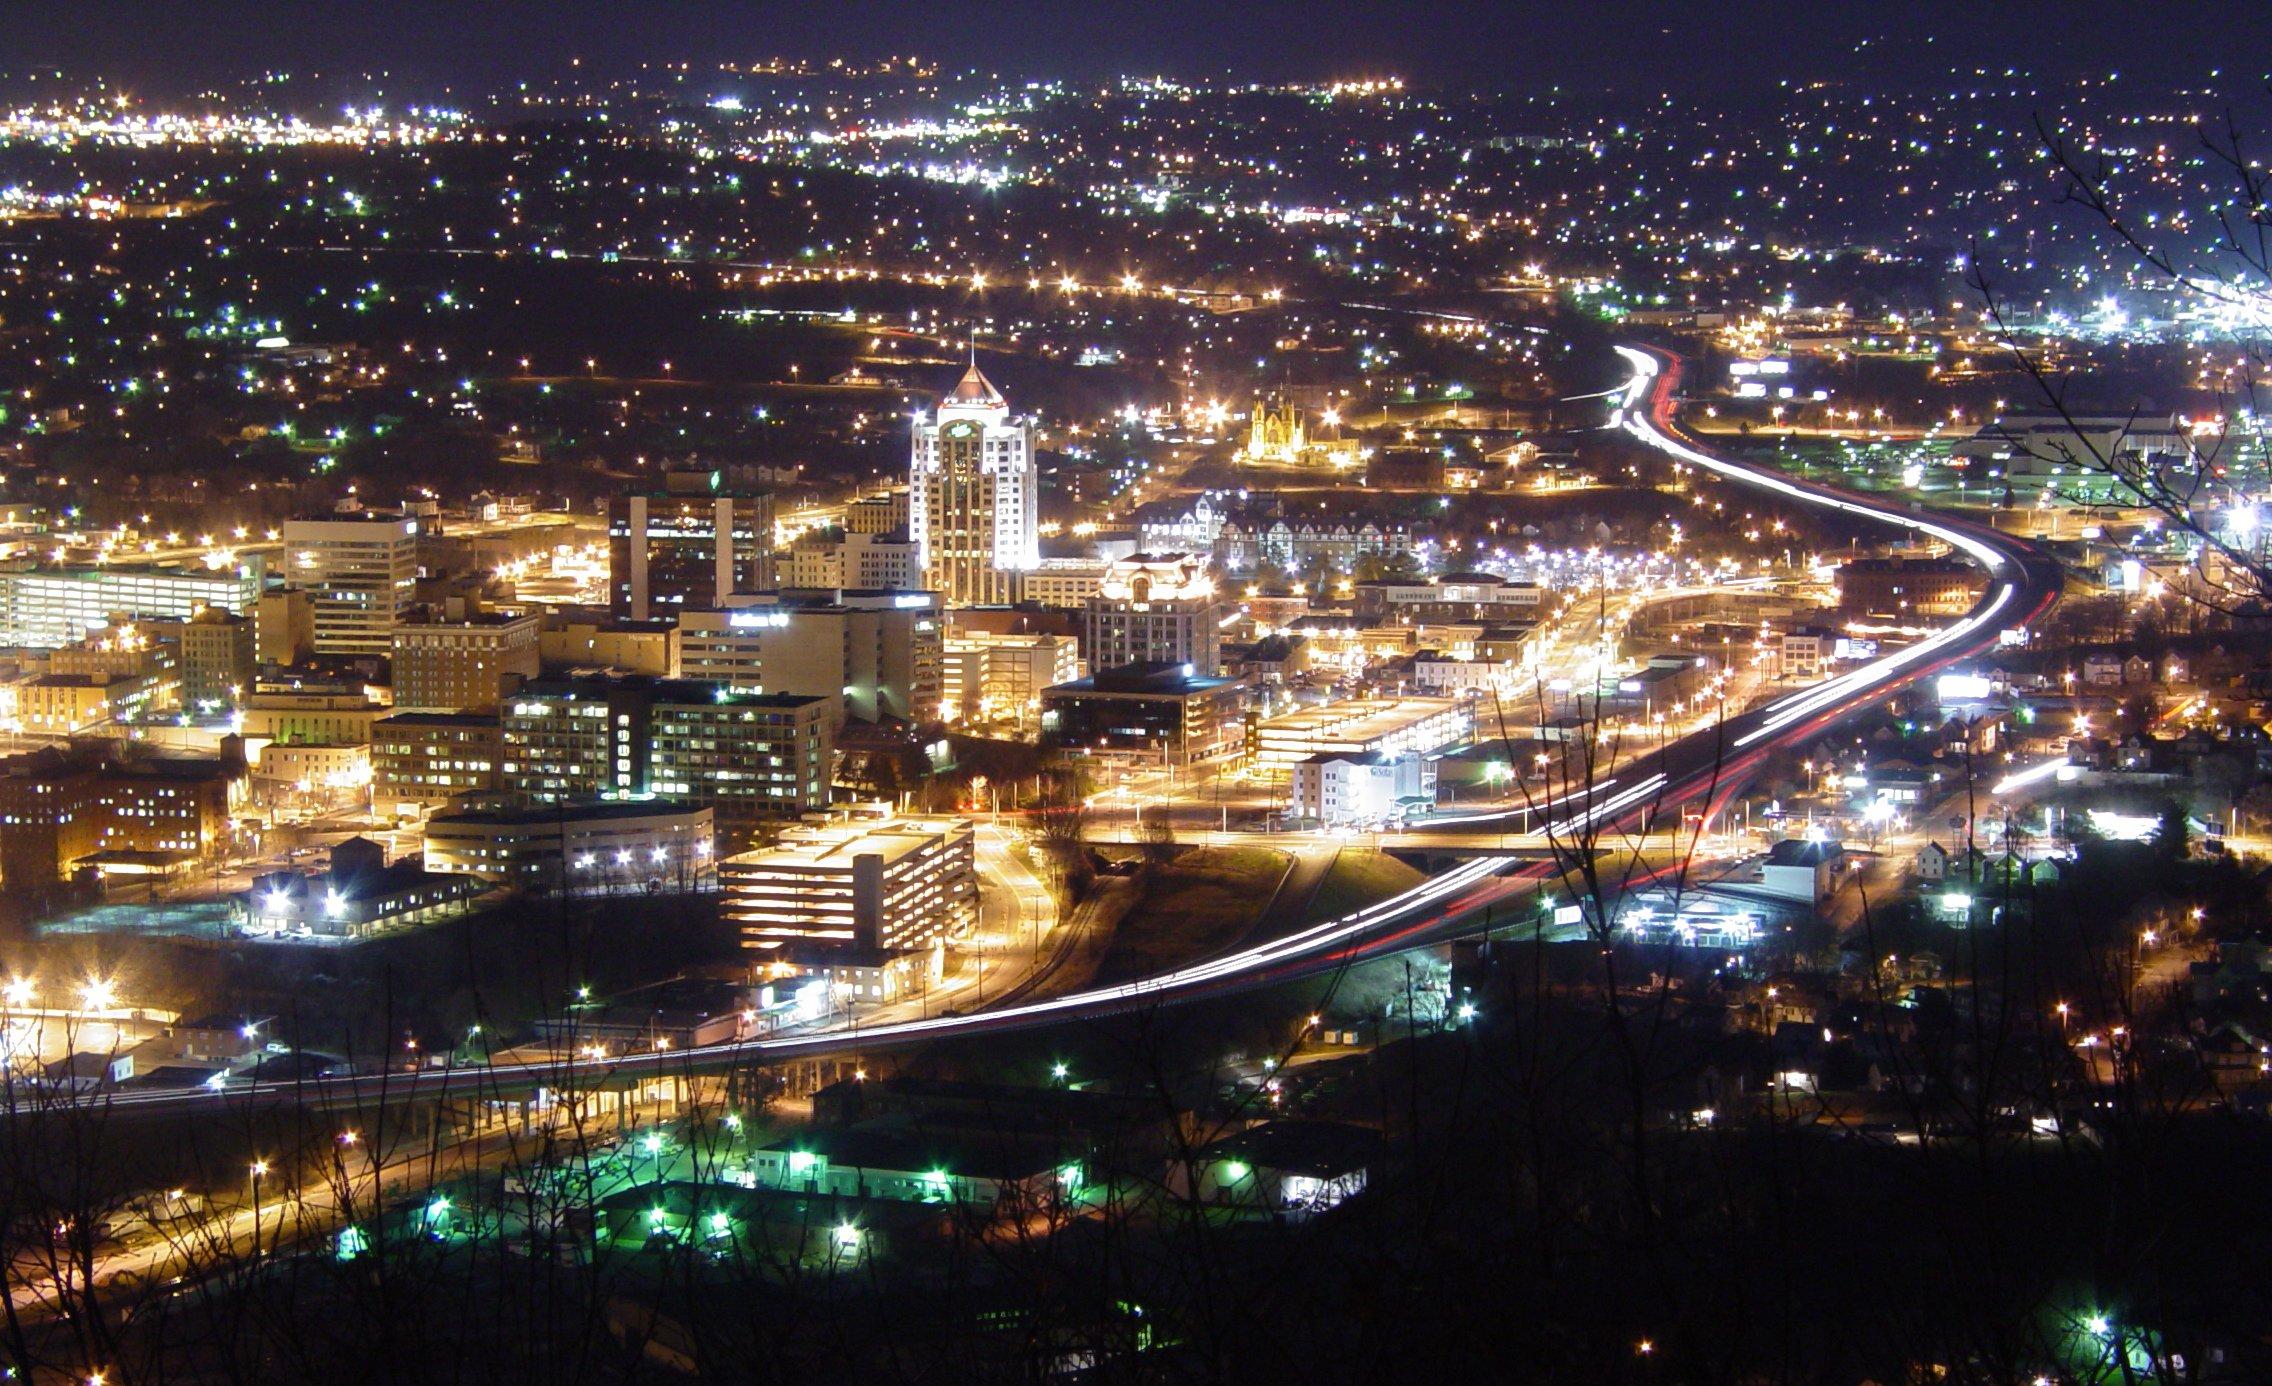 File:Roanoke, Virginia at night.jpg